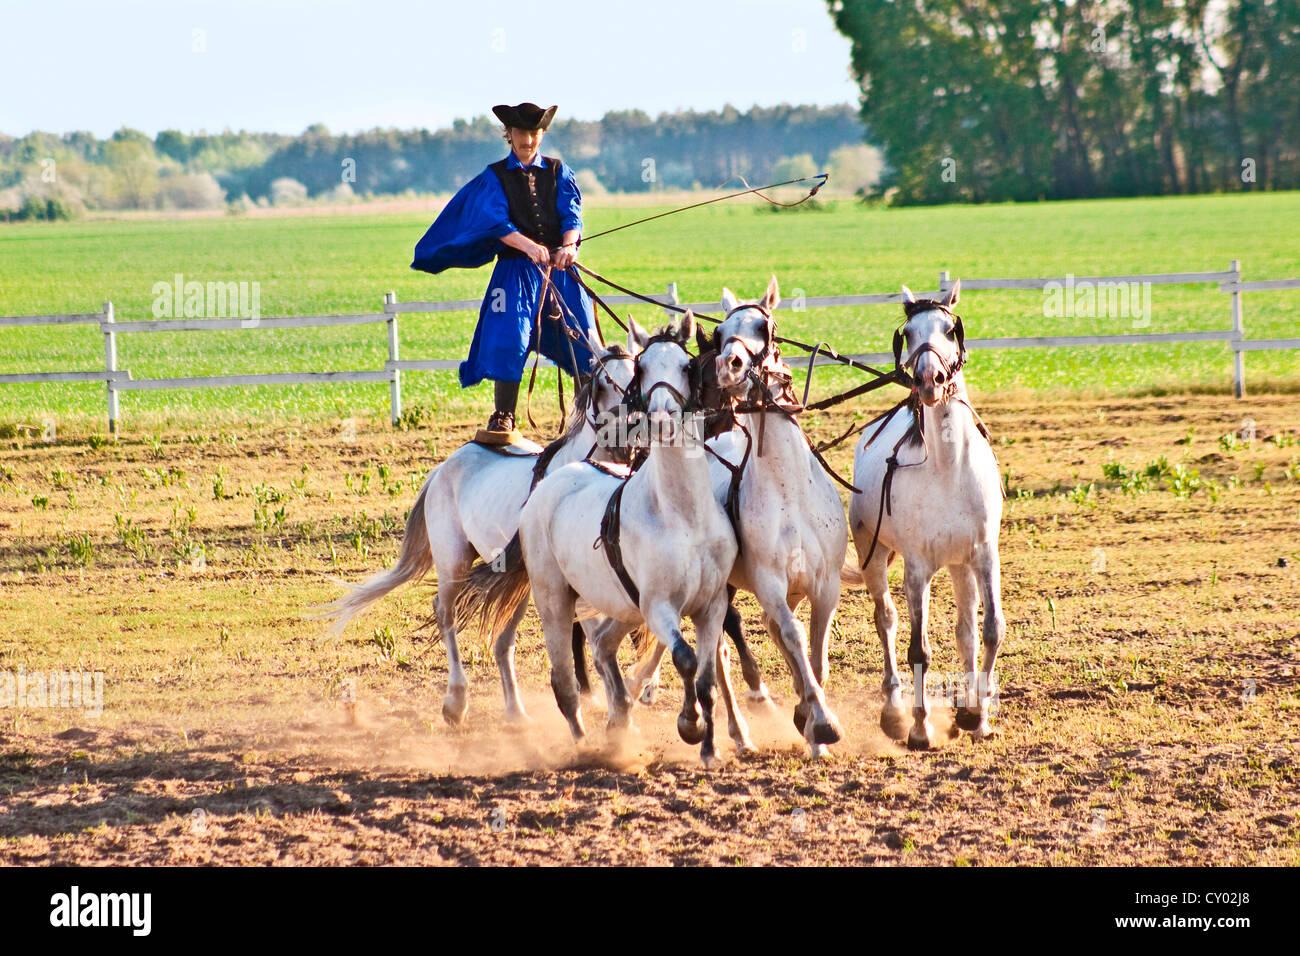 Hungary, Kalocsa, Csikos Hungarian horse rider, riding his team while standing - Stock Image